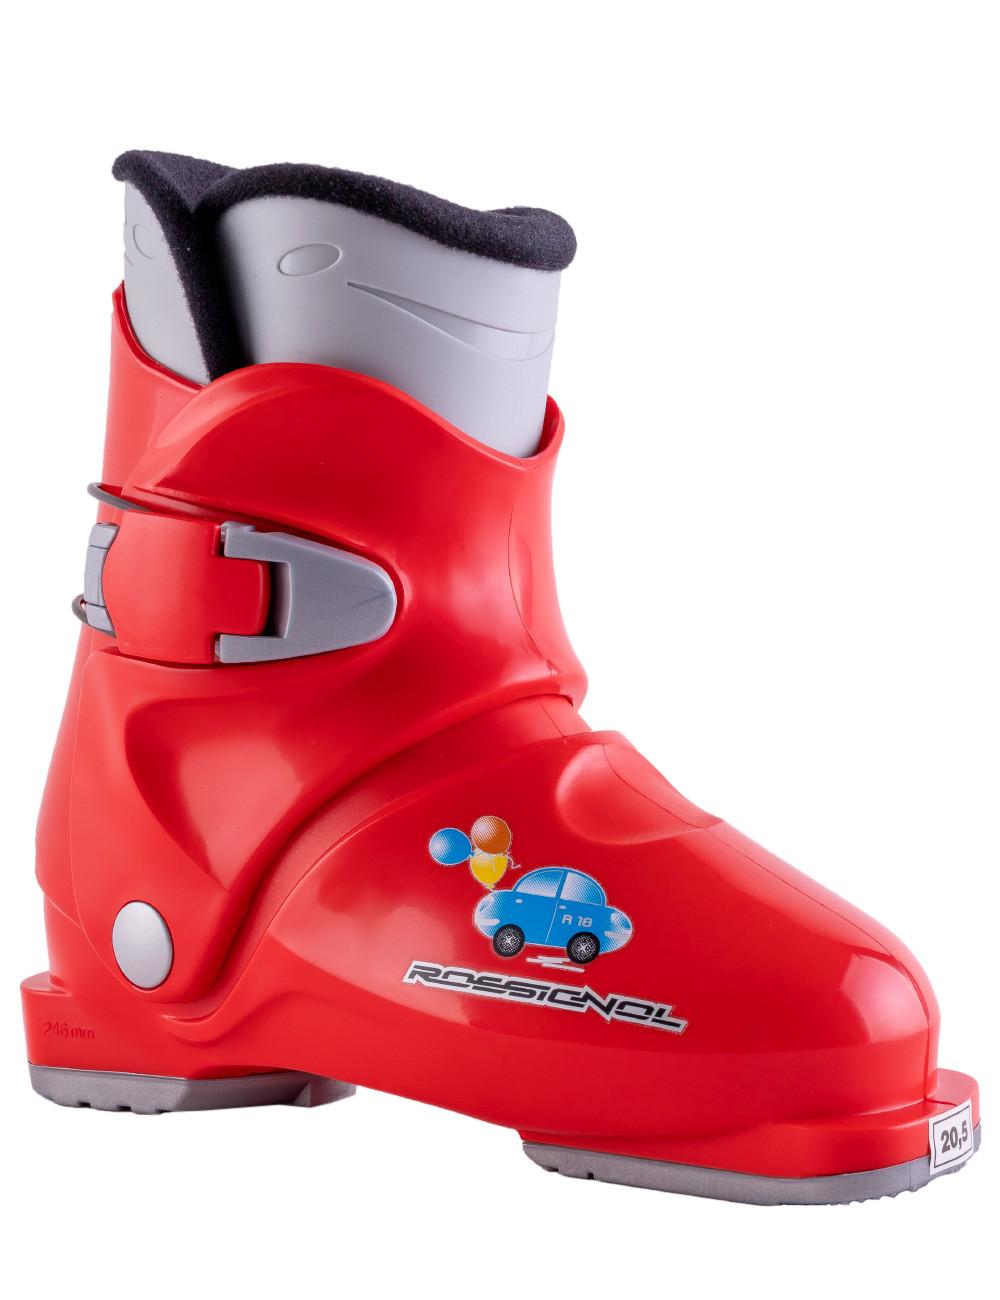 Buty narciarskie Rossignol R18